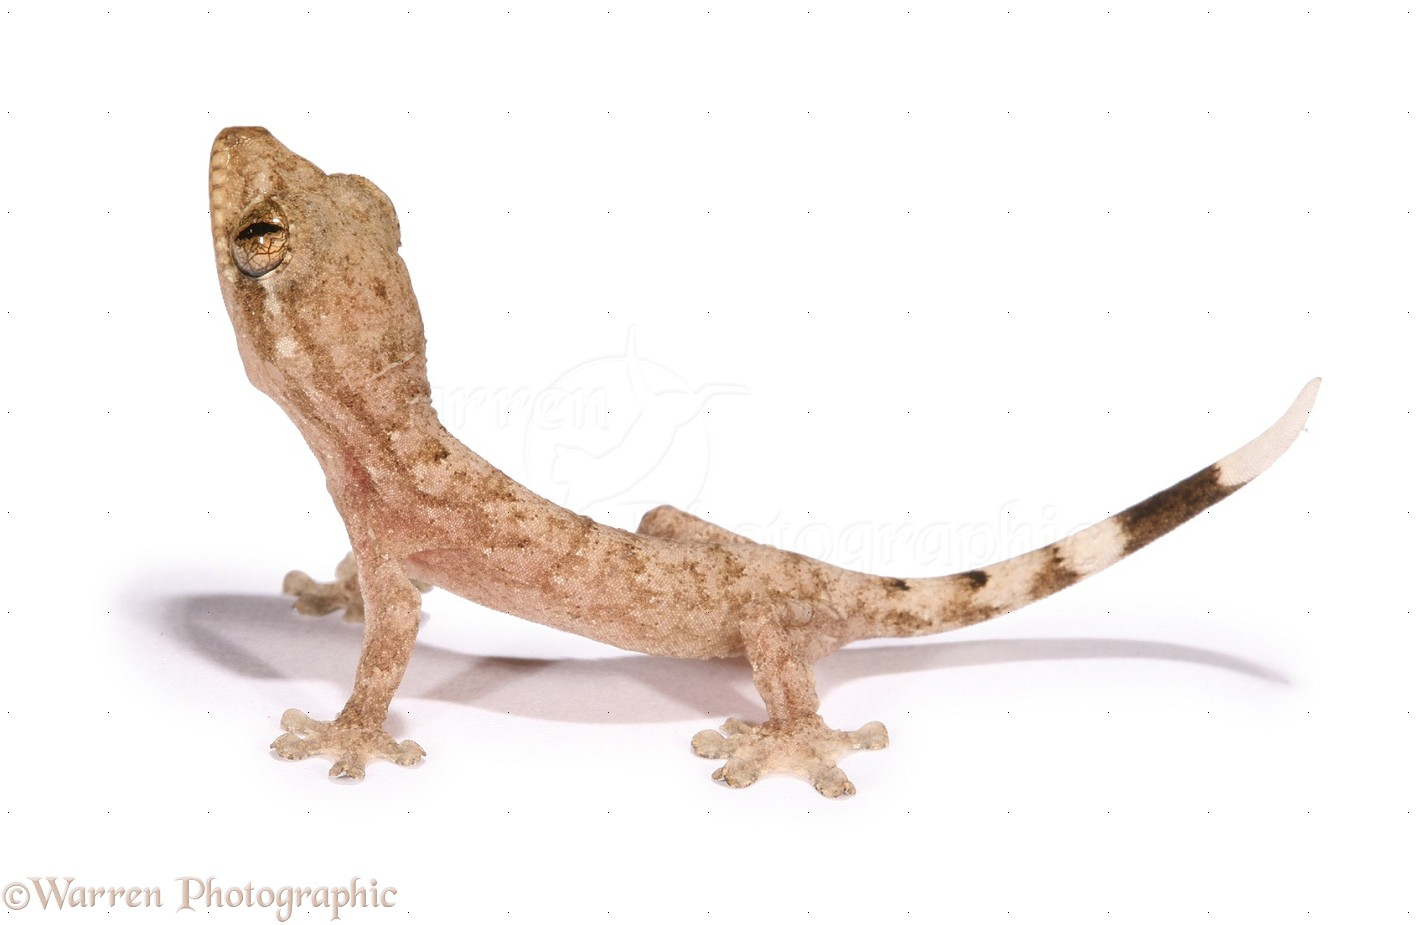 house gecko juvenile photo - wp12852